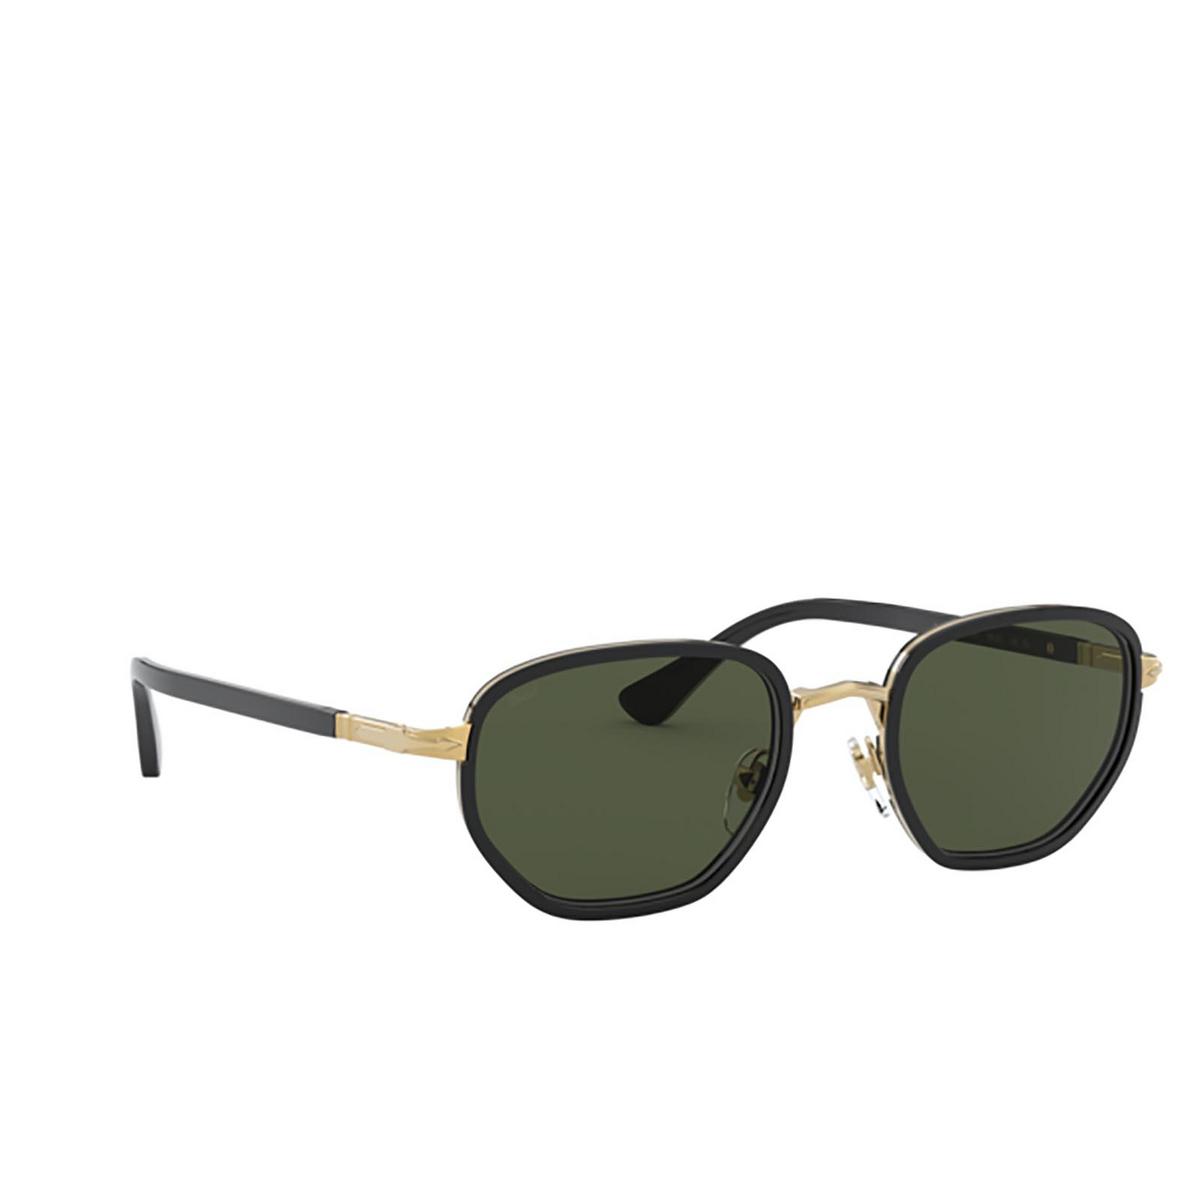 Persol® Irregular Sunglasses: PO2471S color Gold & Black 109731 - three-quarters view.